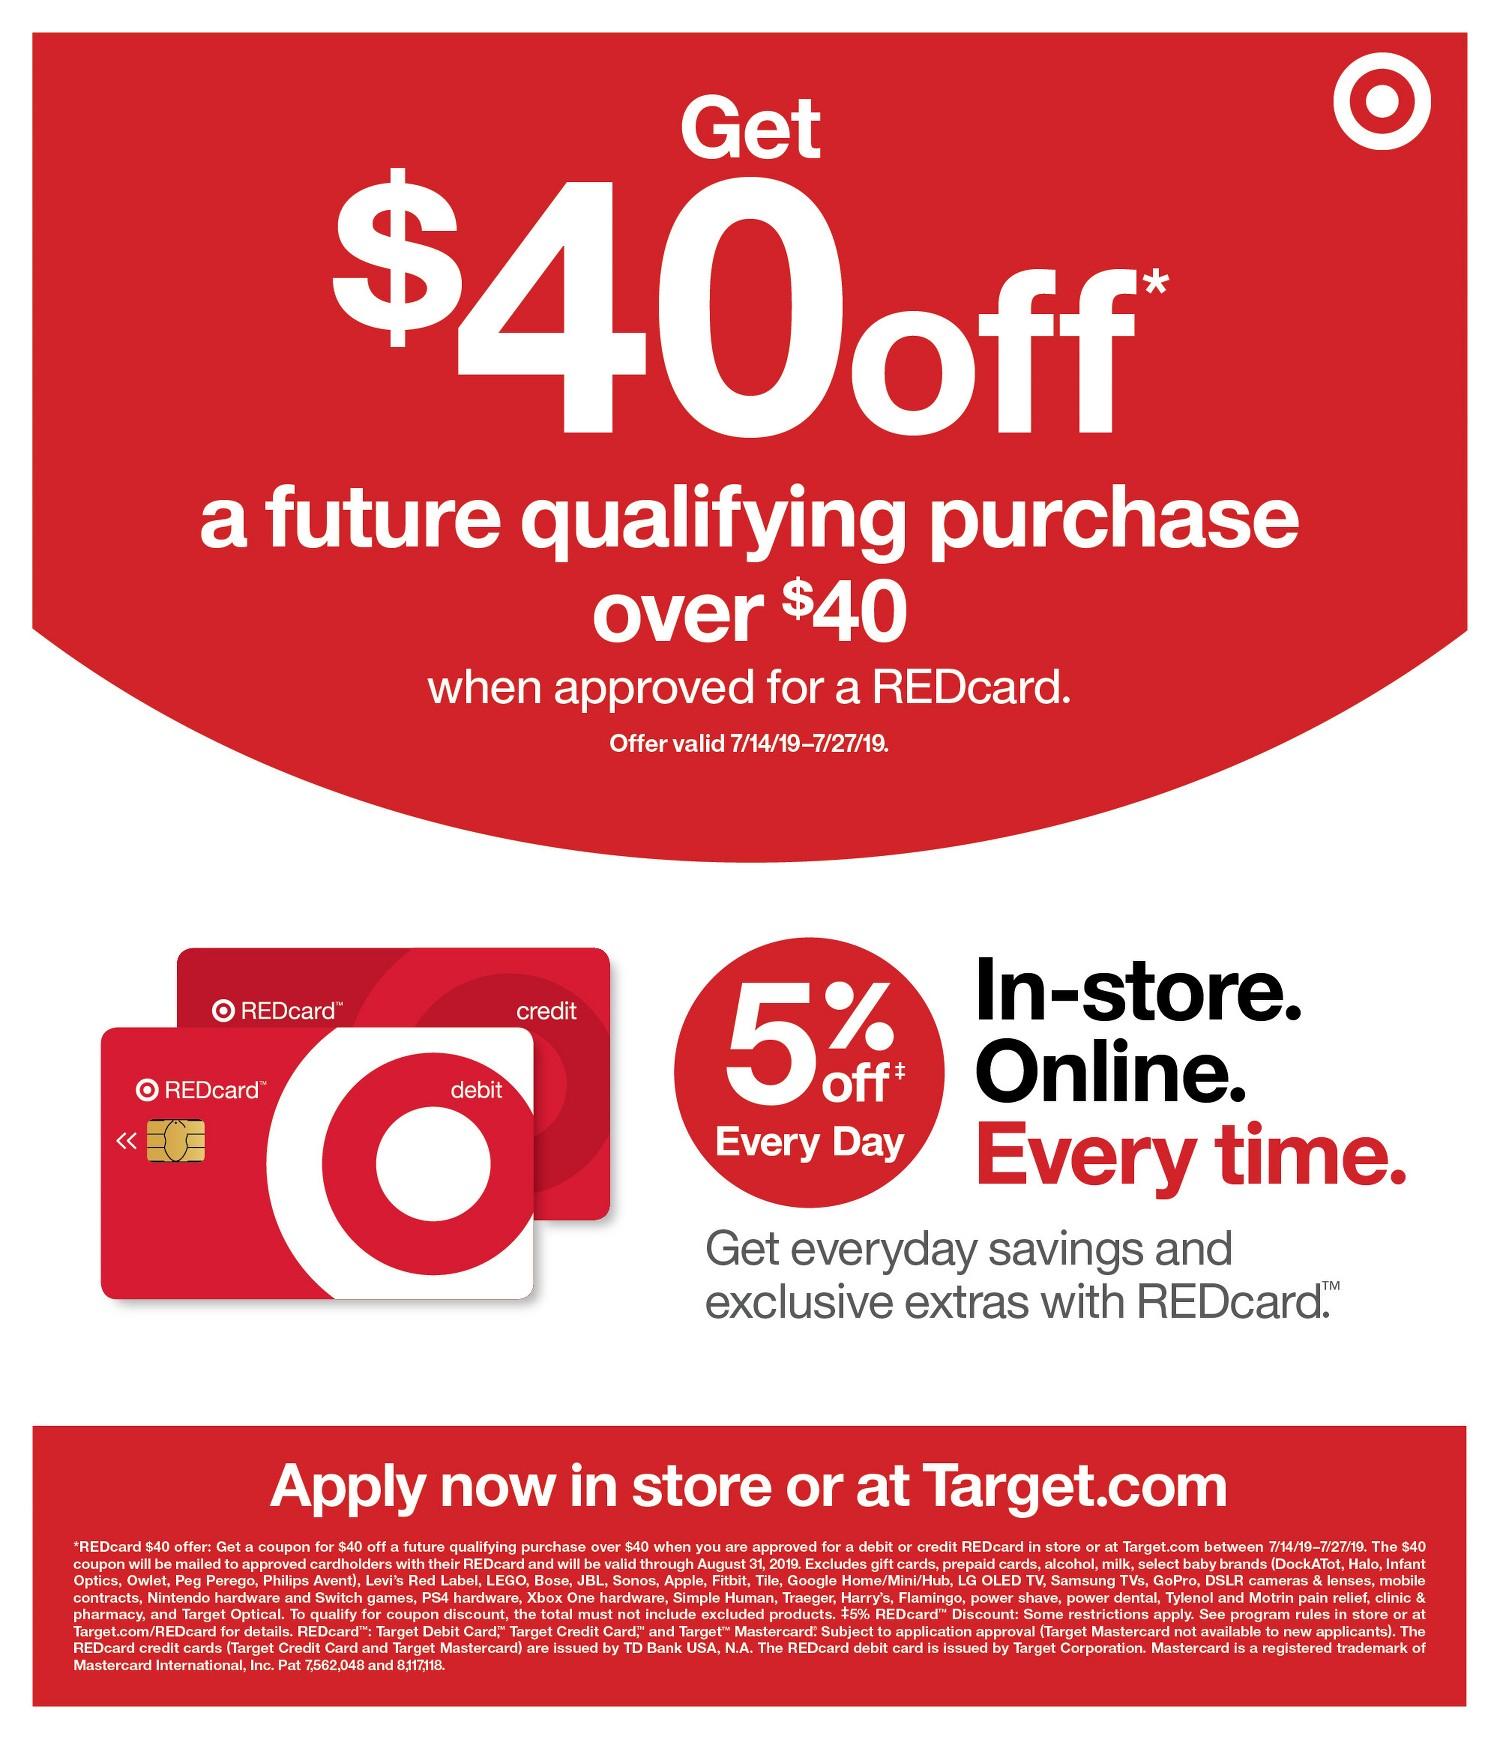 target coupon code toilet paper